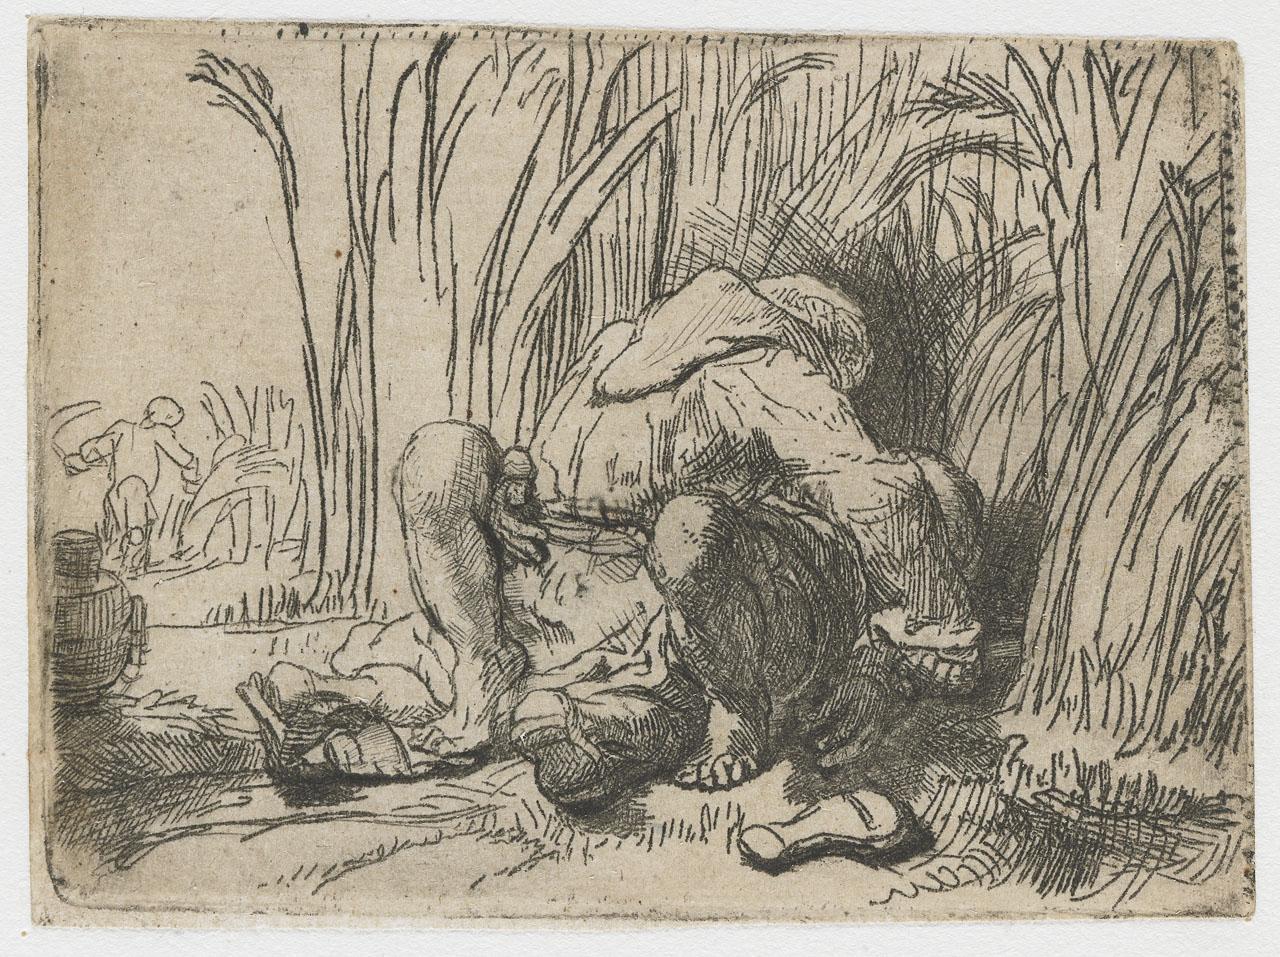 Grosser Anatomy: Rembrandt\'s Polemical Erotica